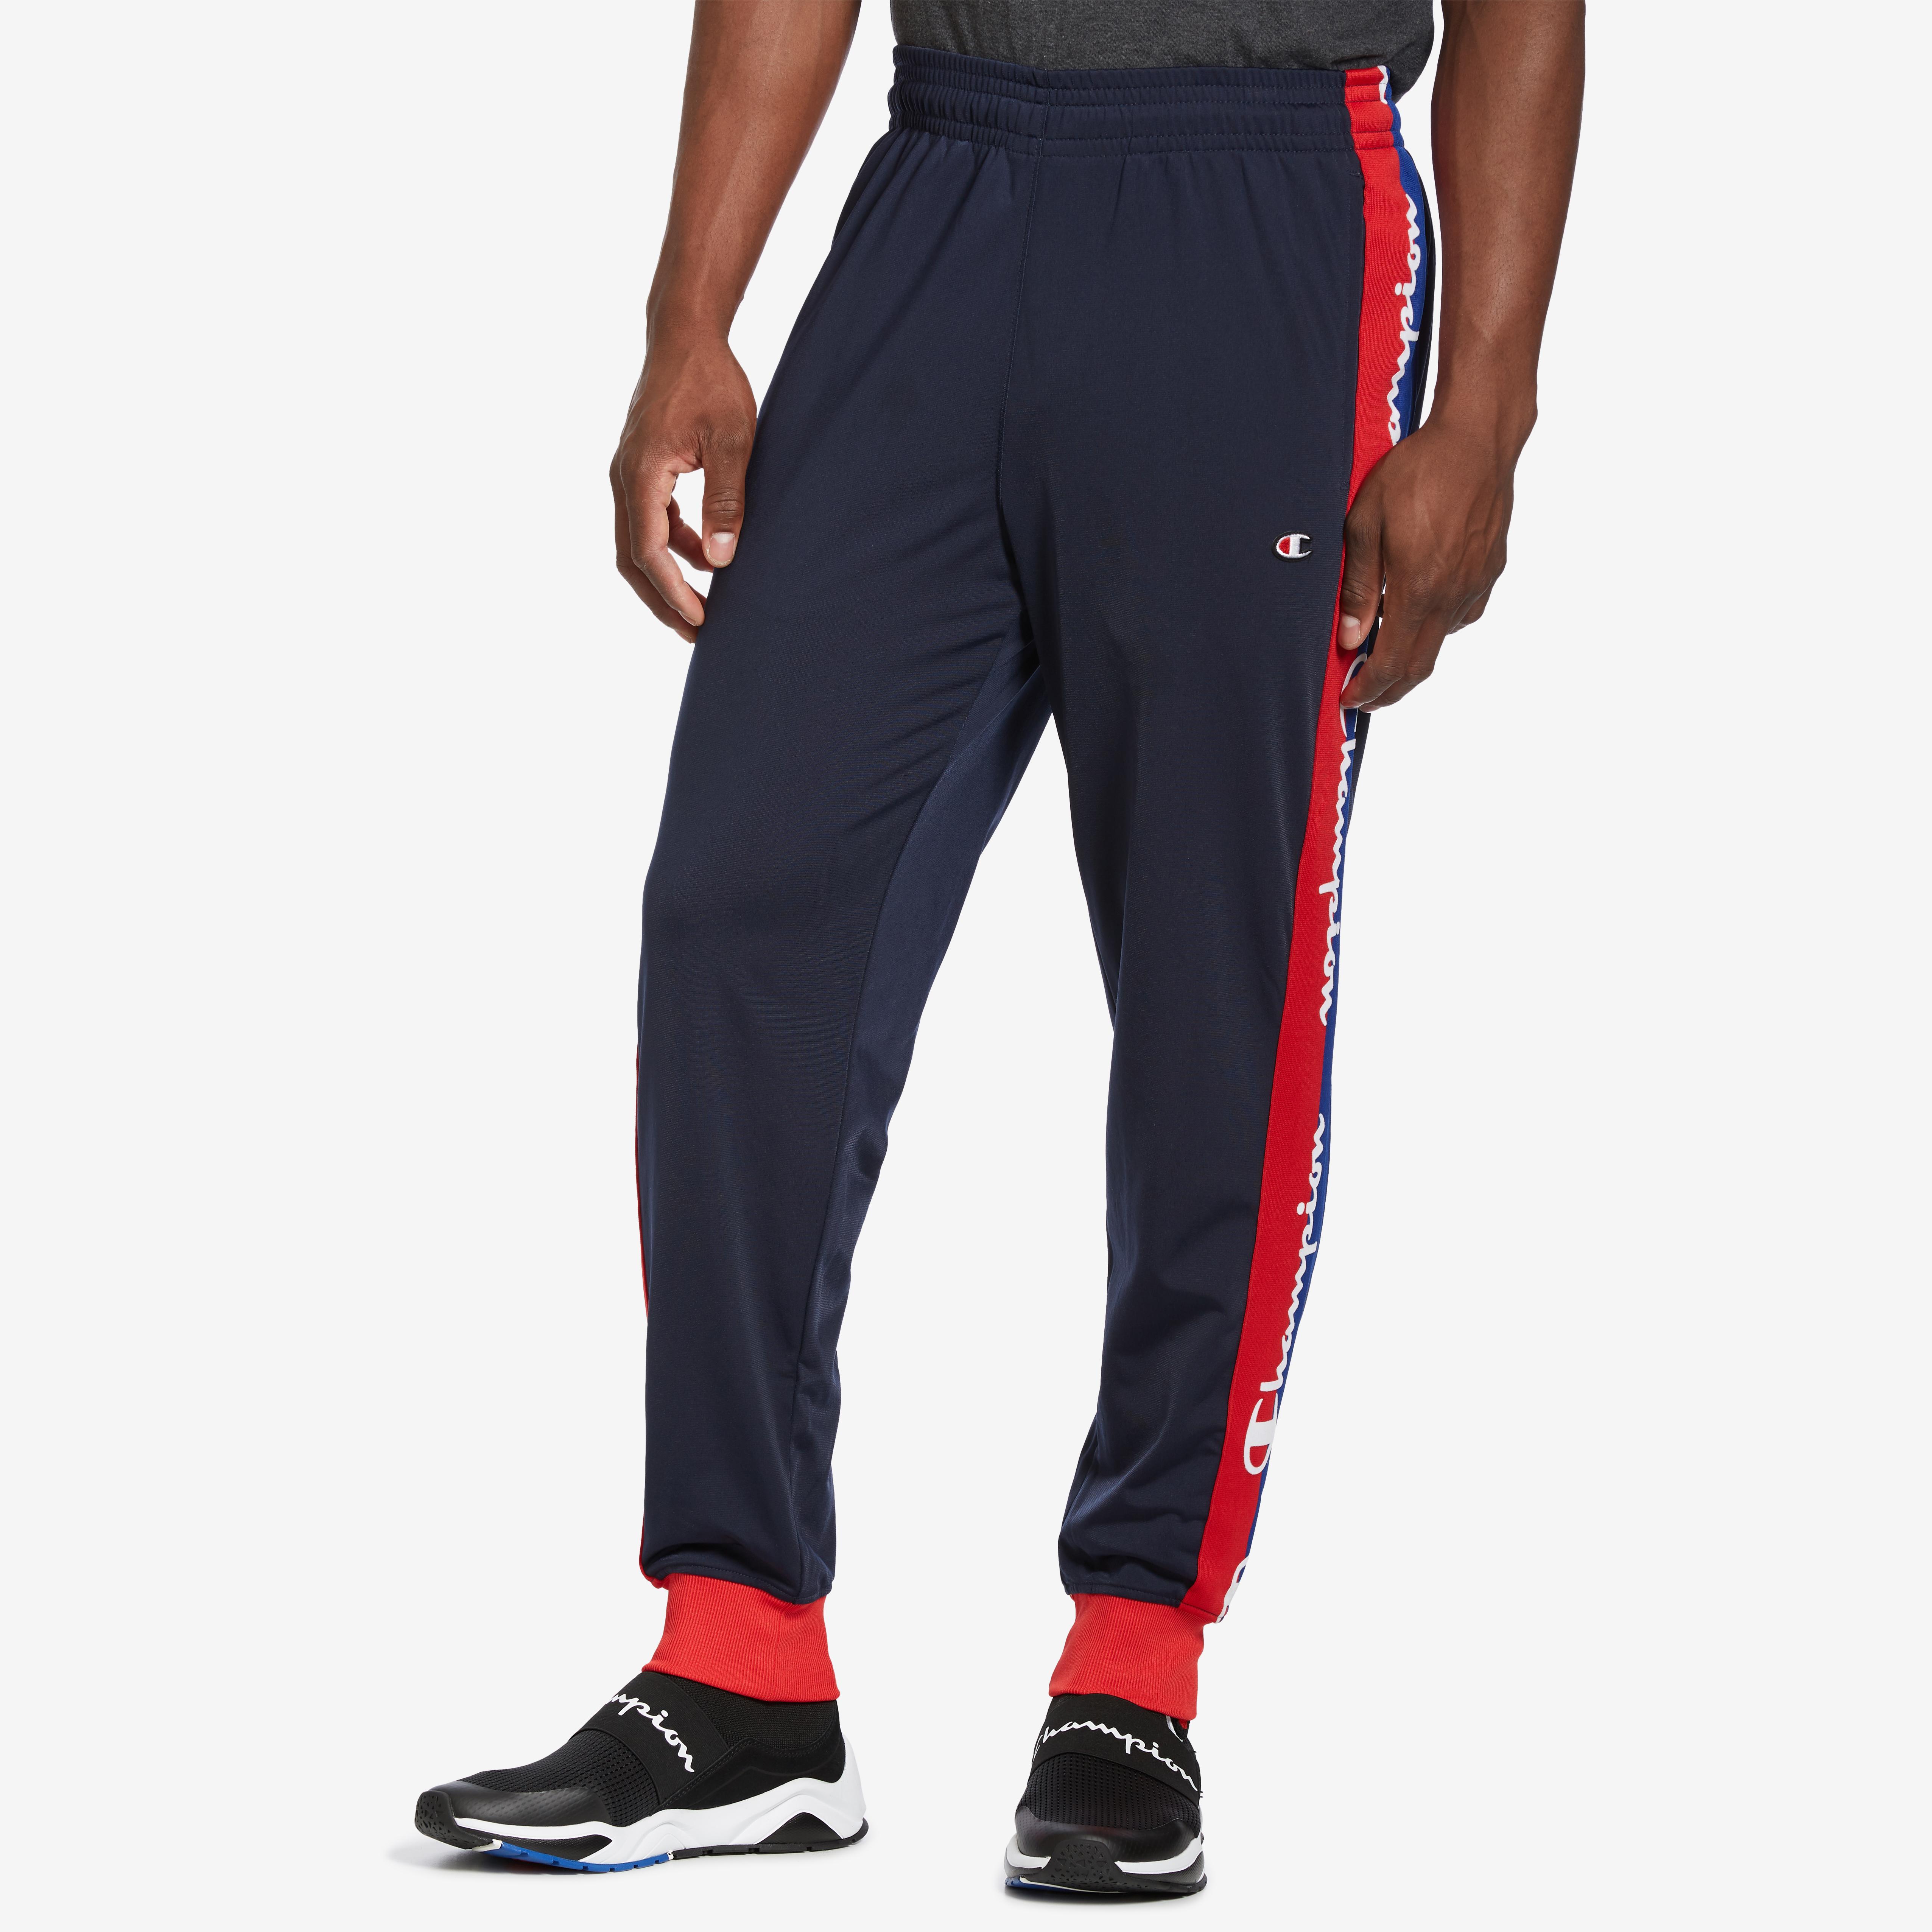 Men's Life Track Pants